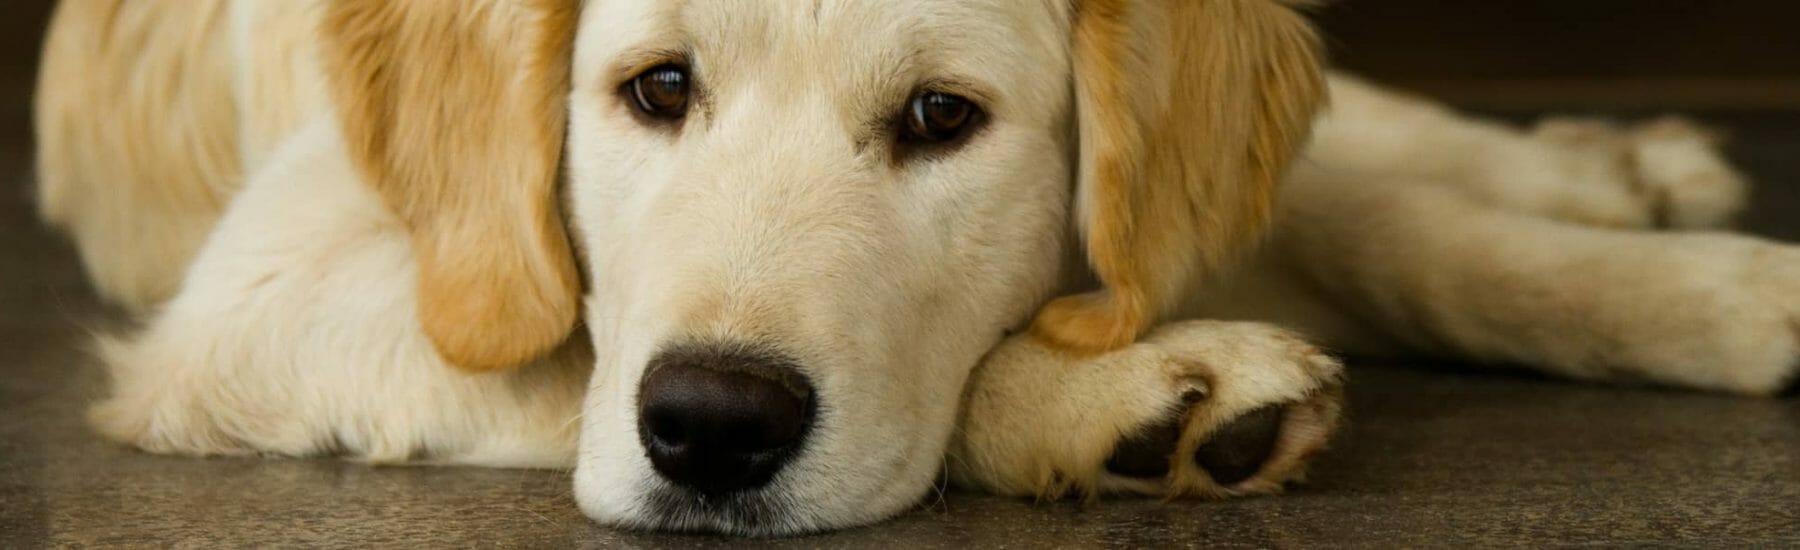 Sad puppy lying down